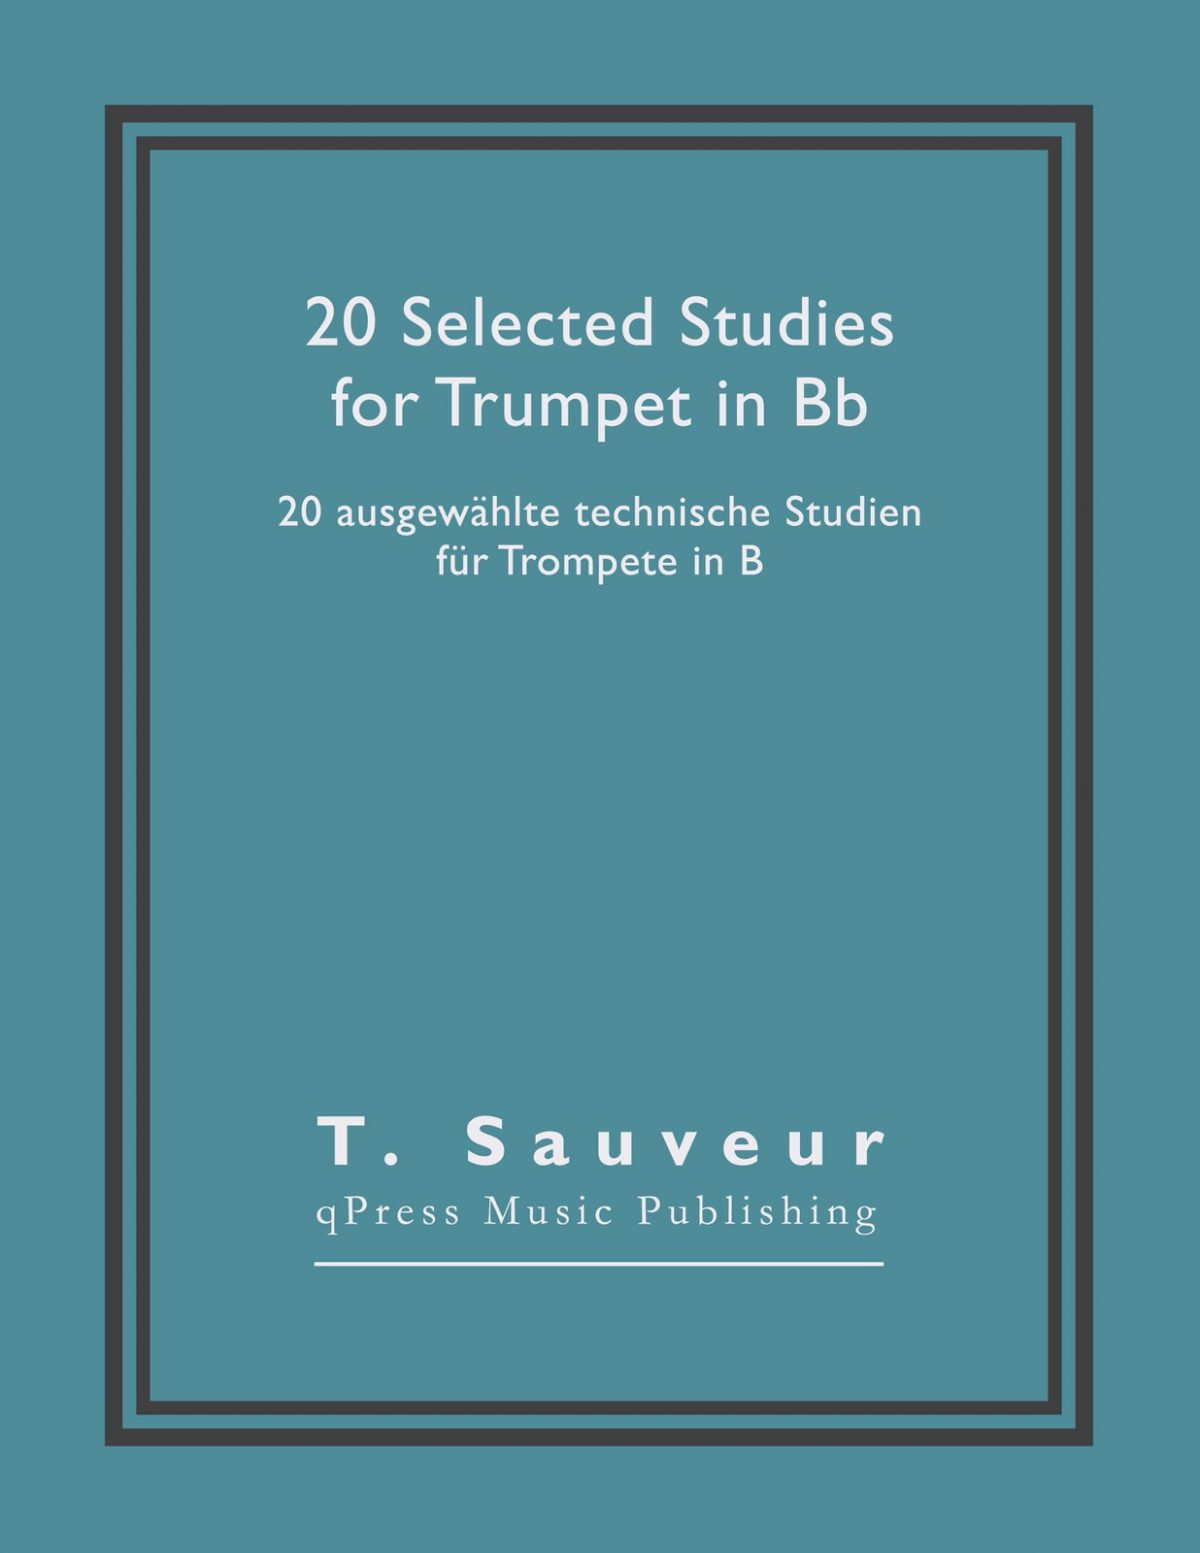 Sauveur, 20 Selected Studies for Bb Trumpet-p01